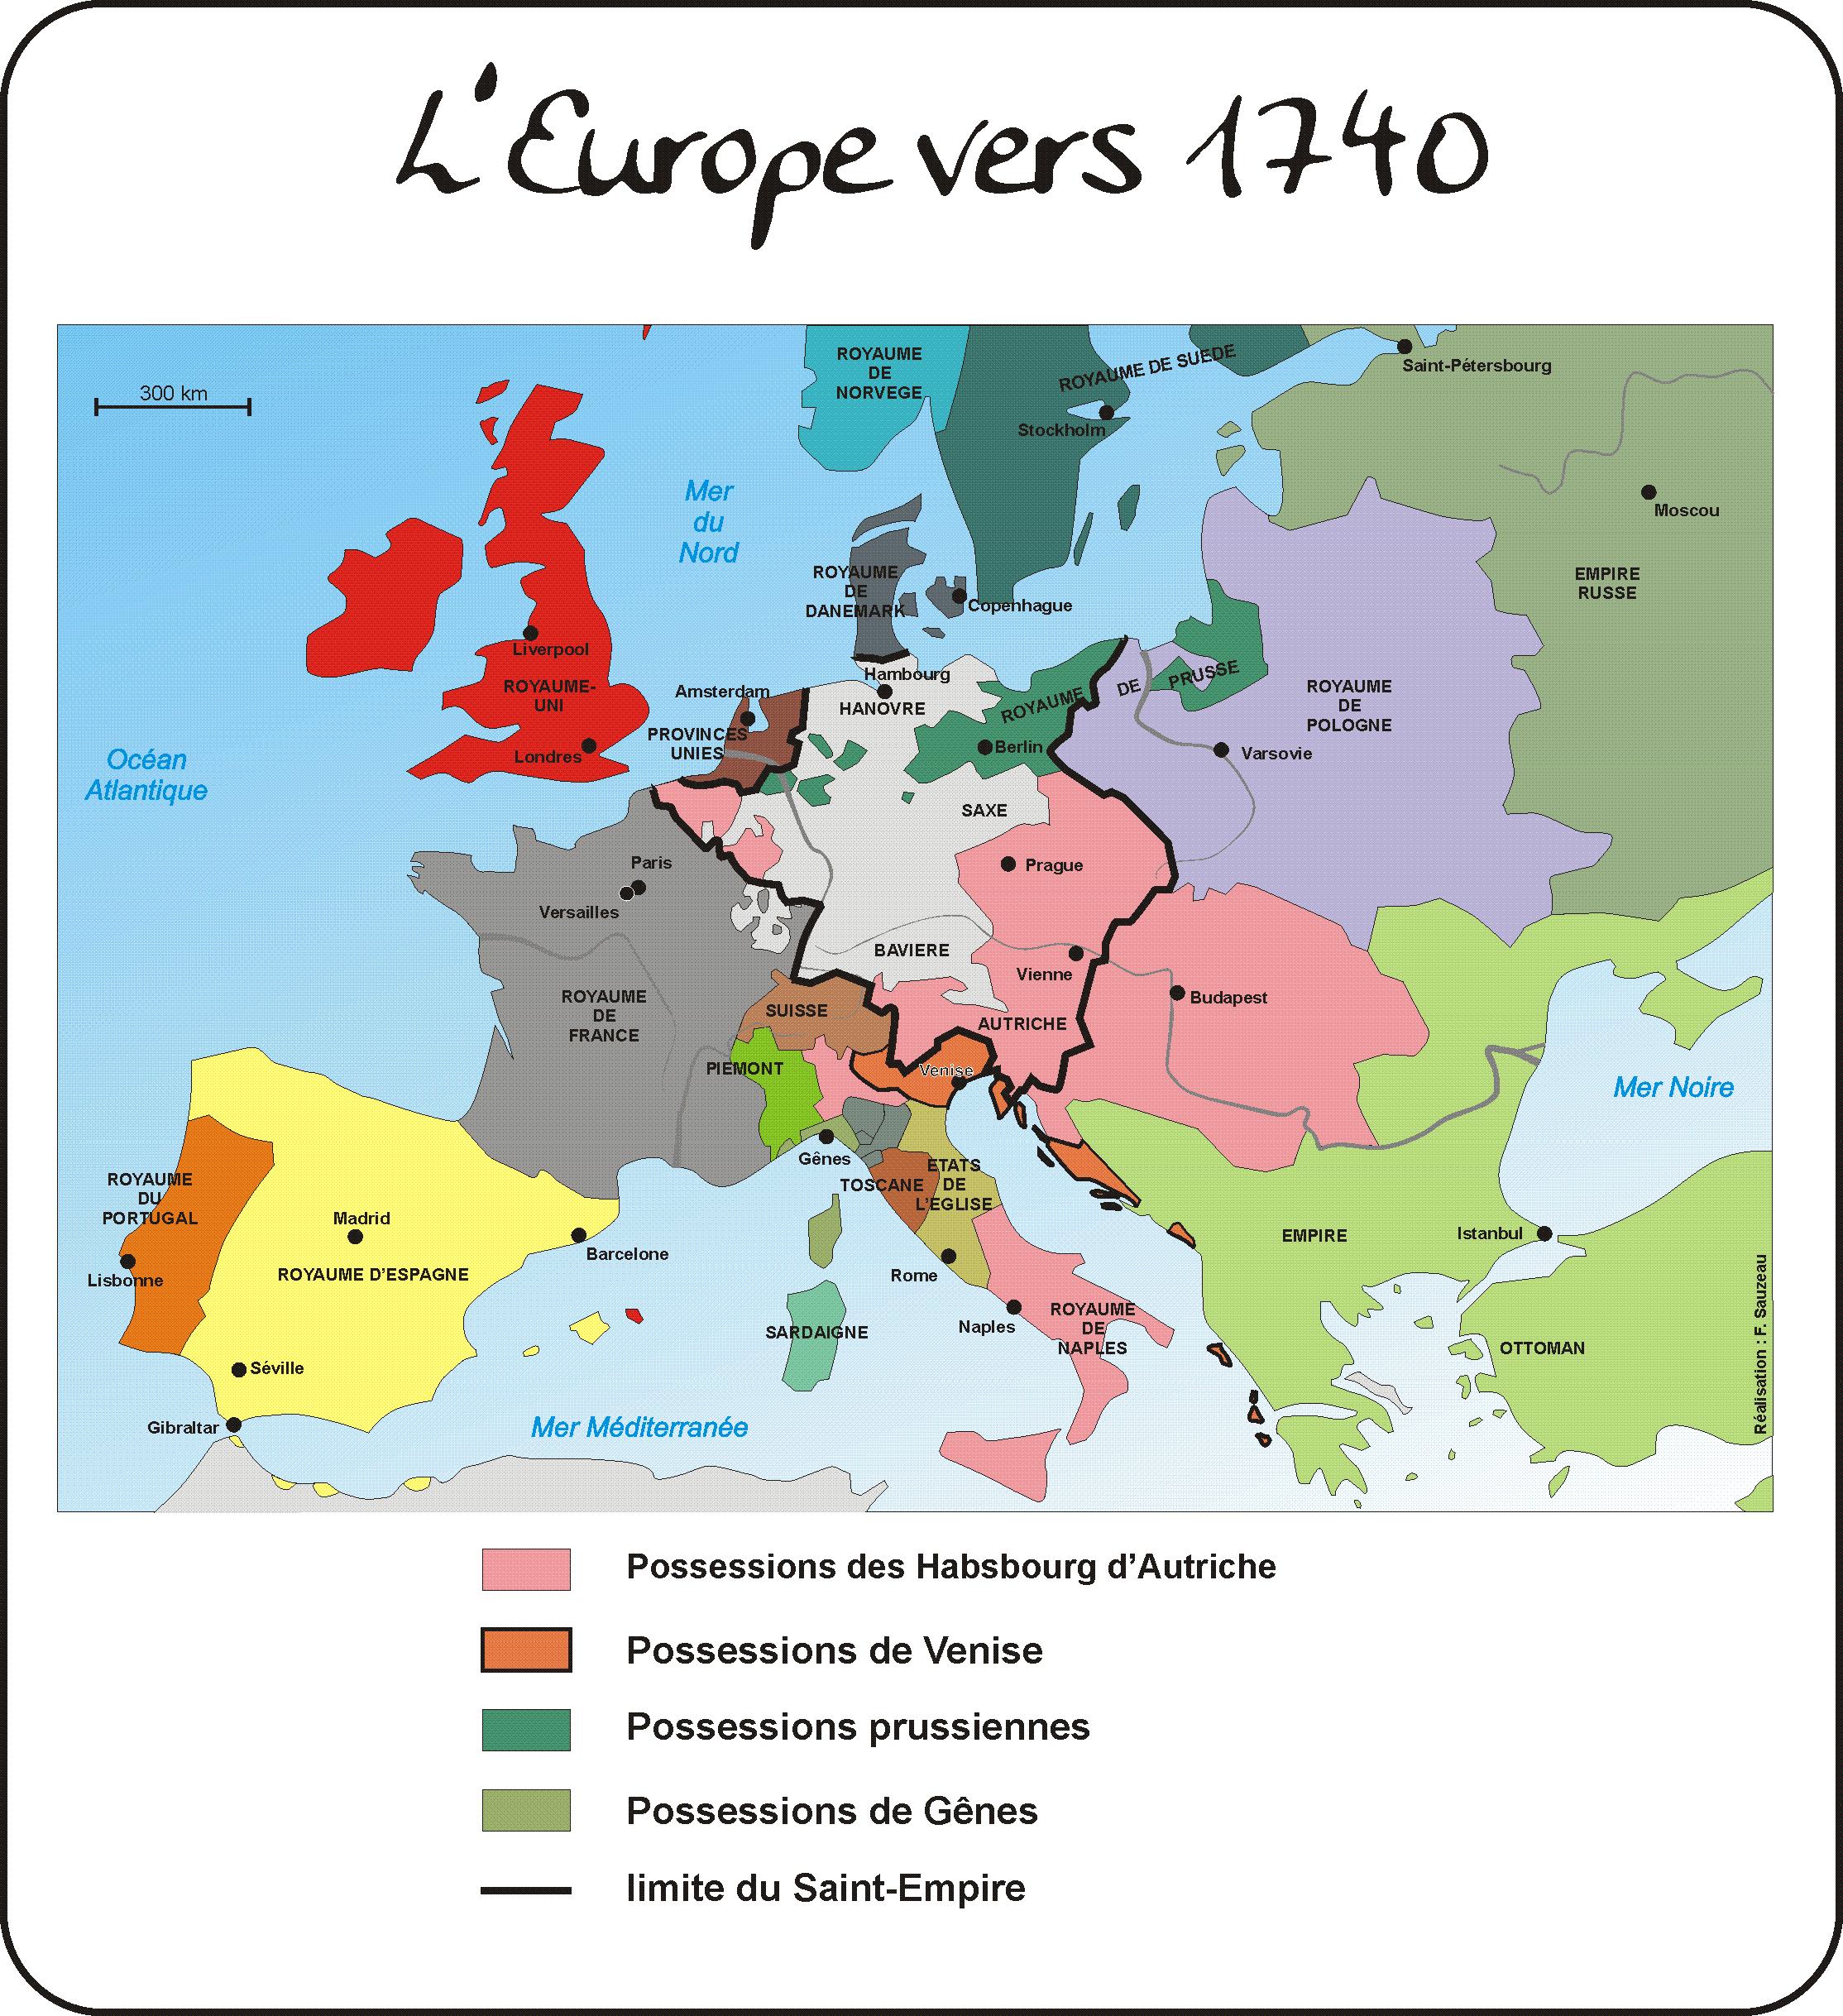 carte europe xviiie siecle